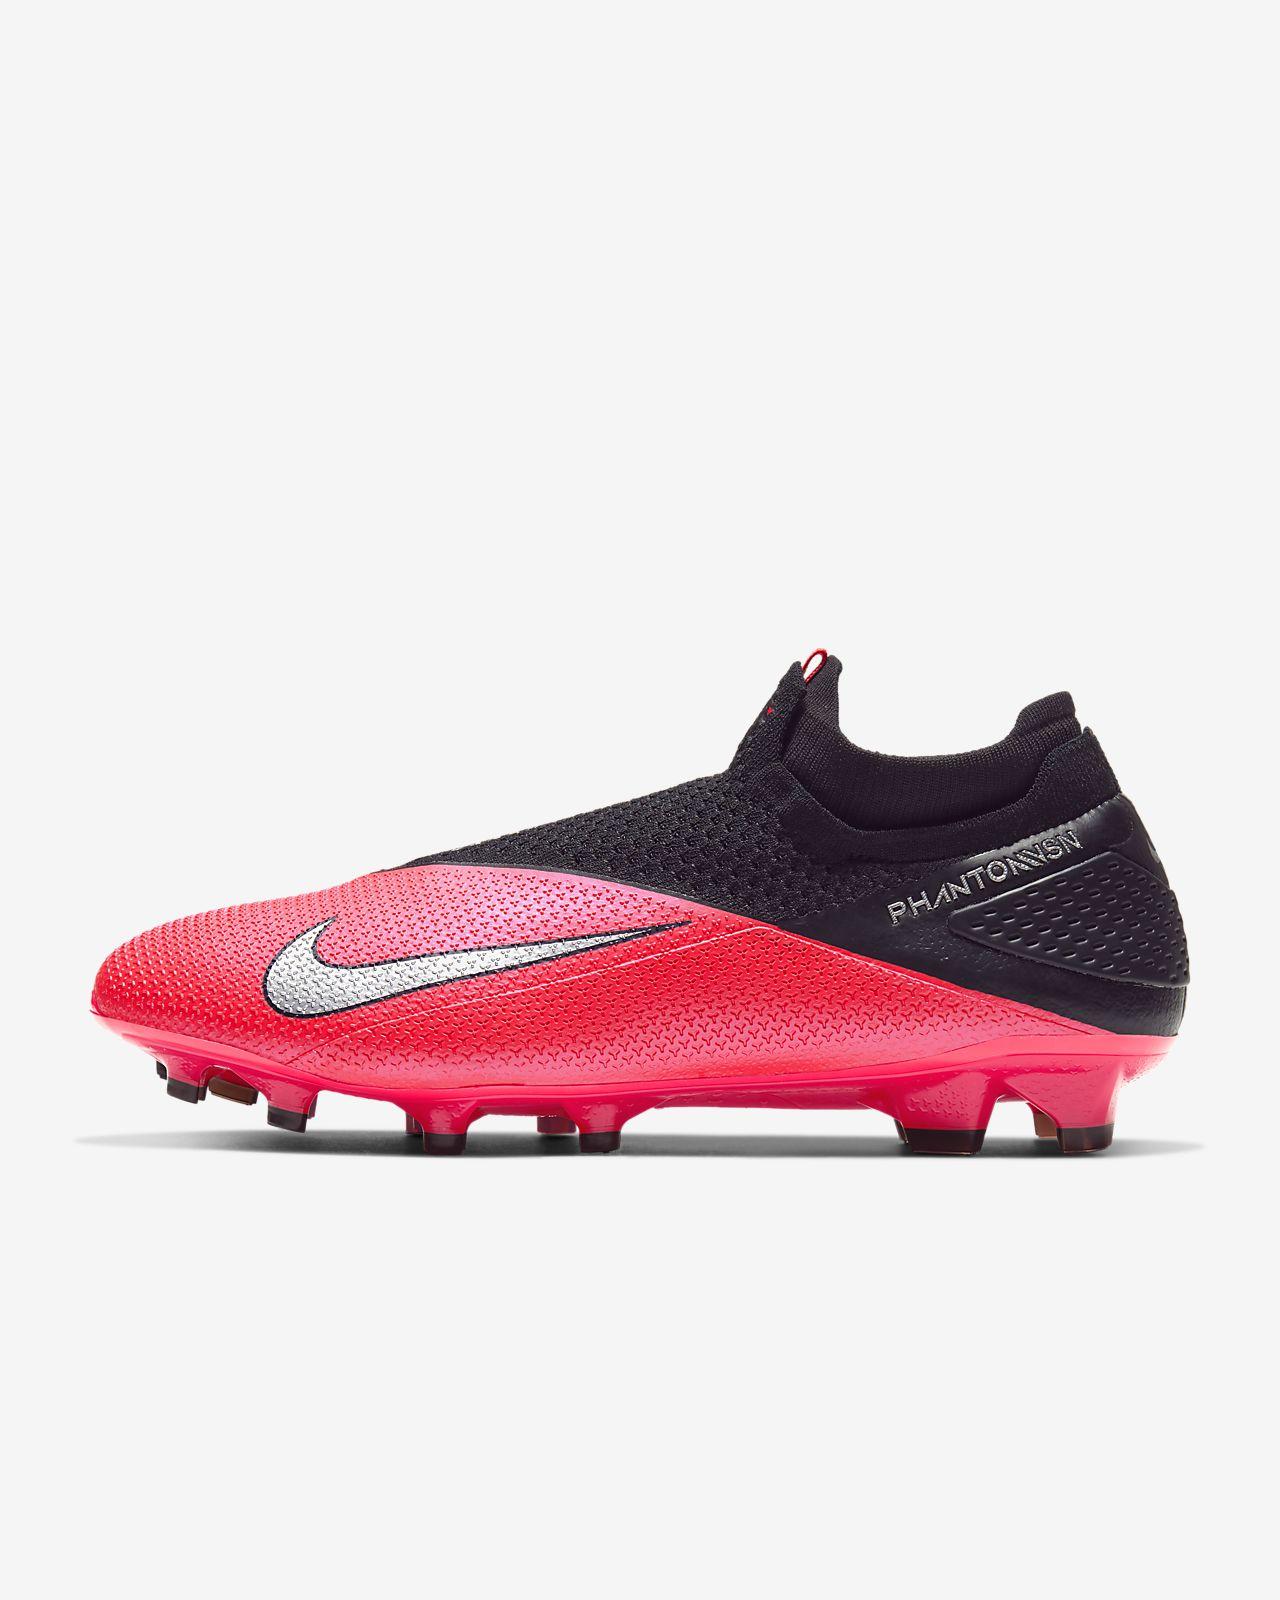 Nike Phantom Vision 2 Elite Dynamic Fit FG Firm-Ground Football Boot